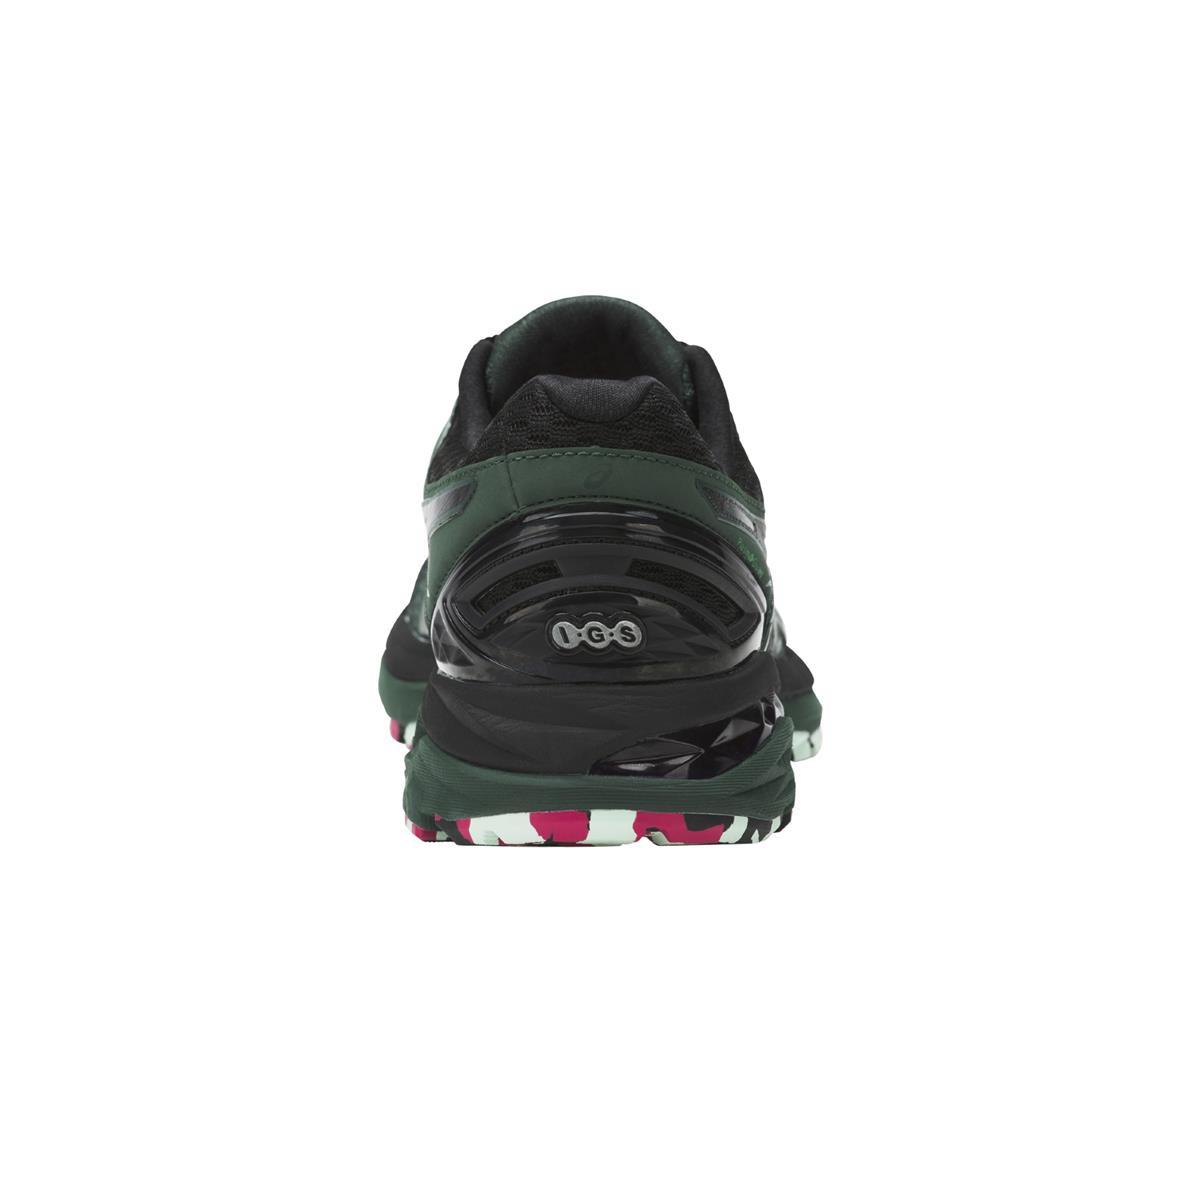 Asics GT-2000 5 Trail PlasmaGuard W 845c4dc8b8